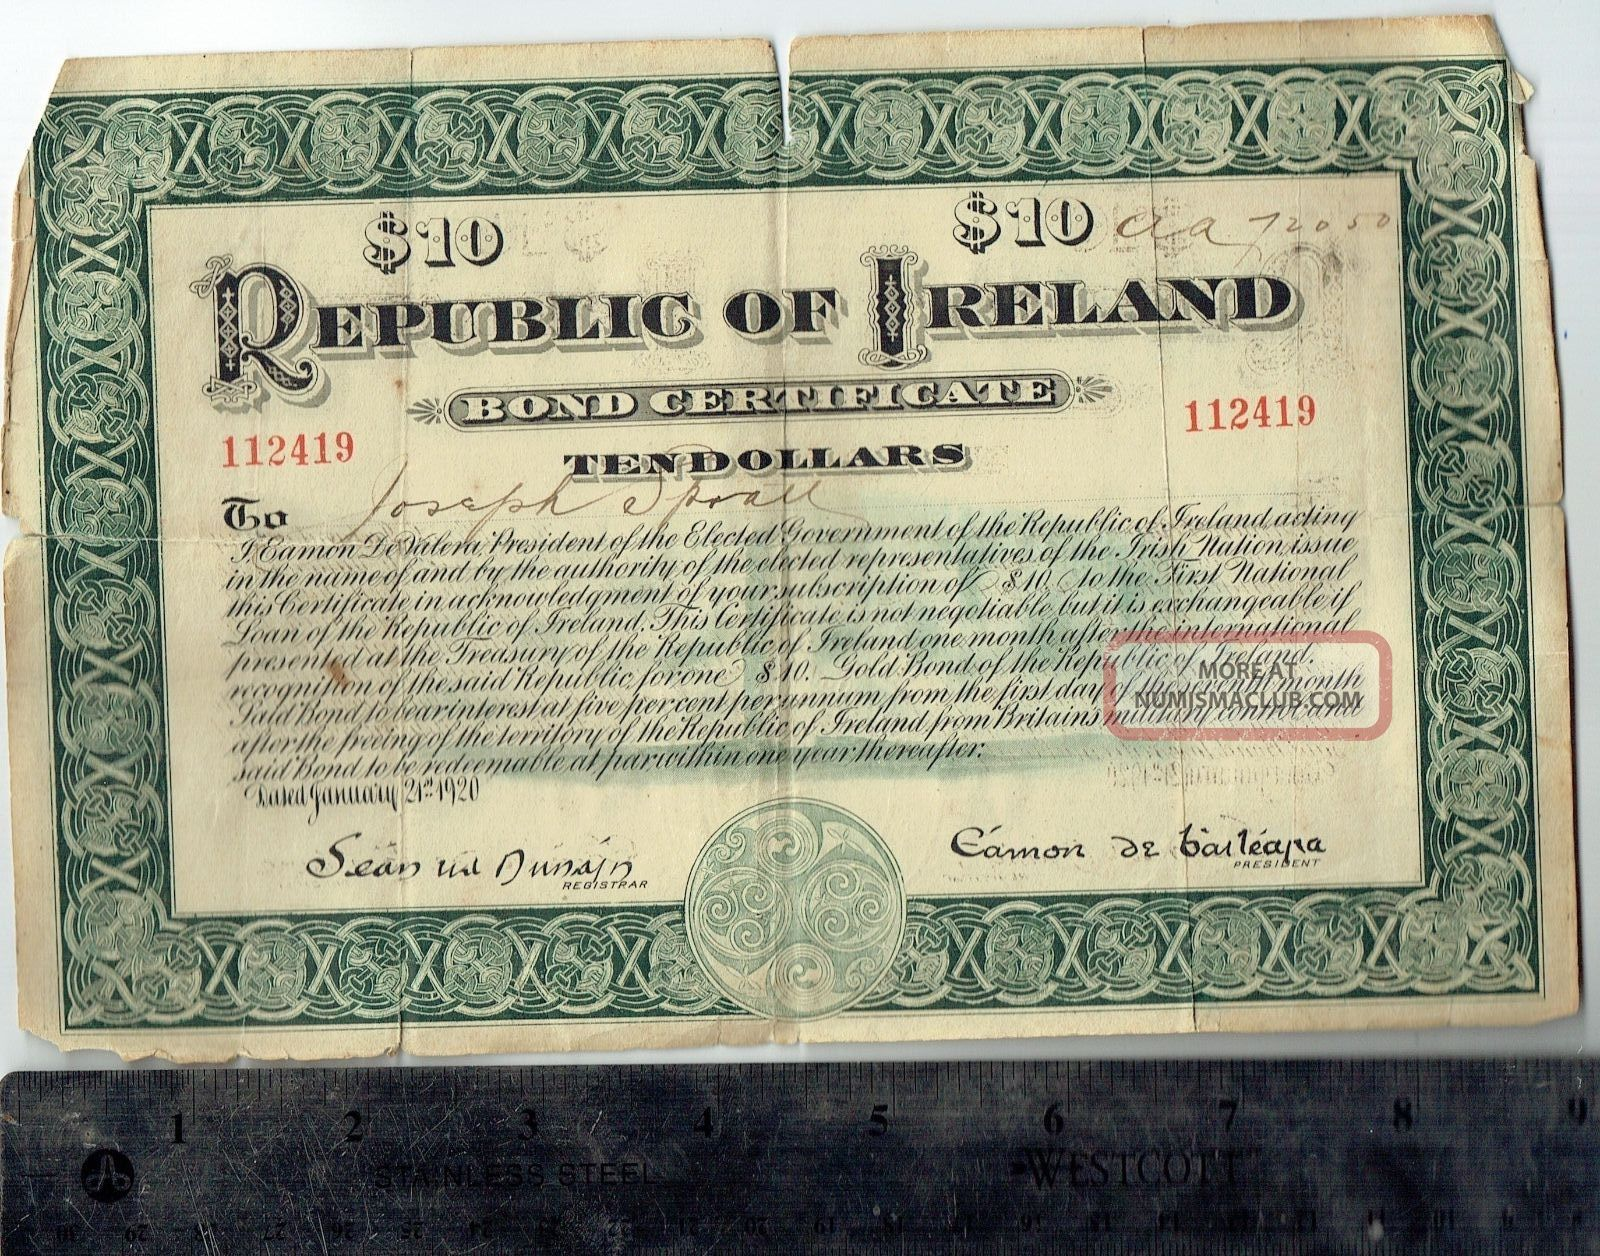 Ireland $10 Bond Certificate Endorsed By Patricia Ann Hurst Eileen Roach Marten Stocks & Bonds, Scripophily photo